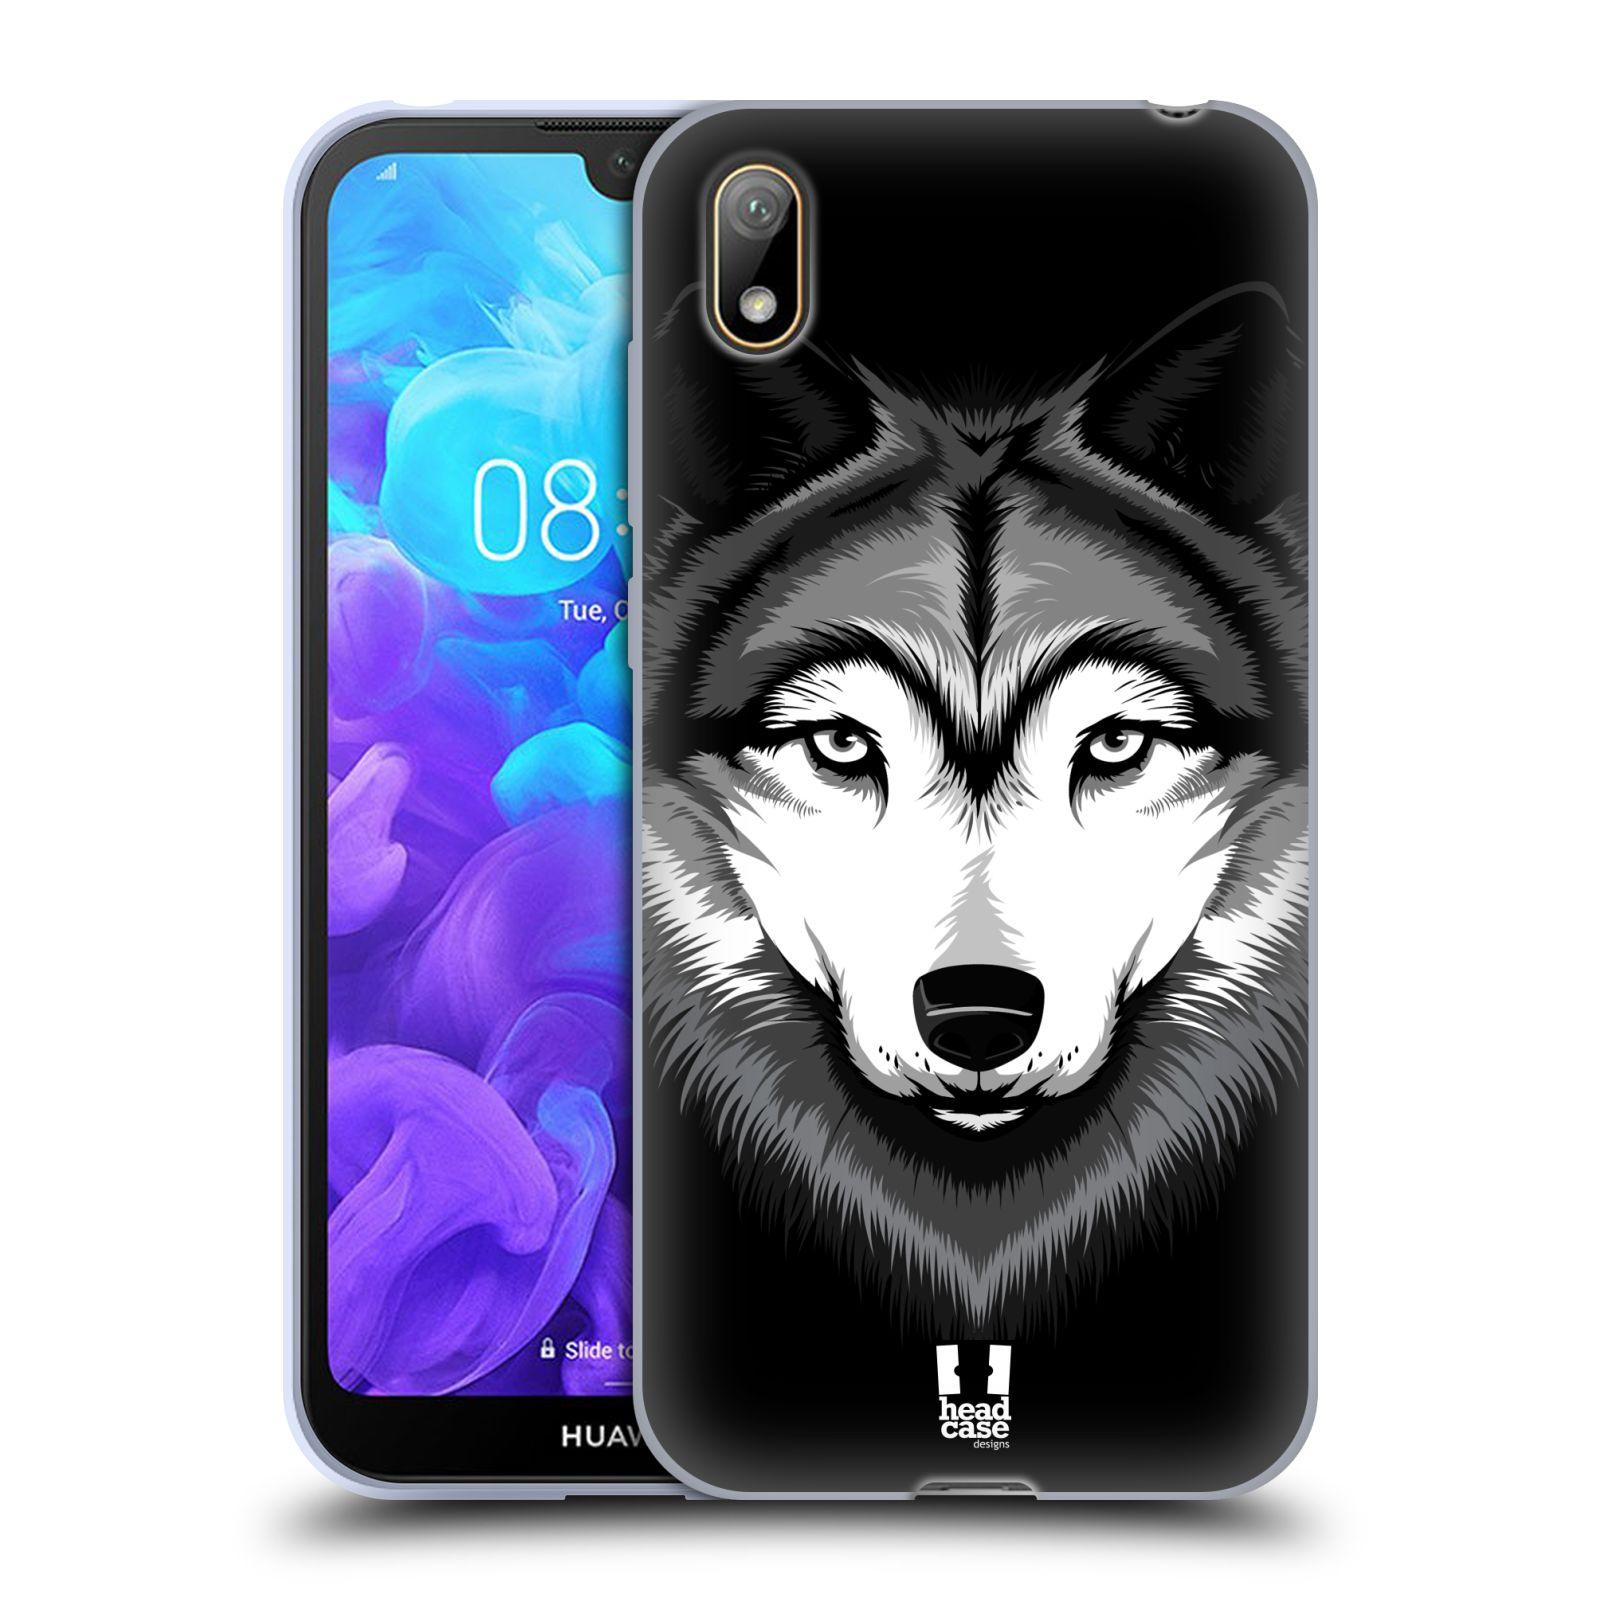 Silikonové pouzdro na mobil Huawei Y5 (2019) - Head Case - ILUSTROVANÝ VLK